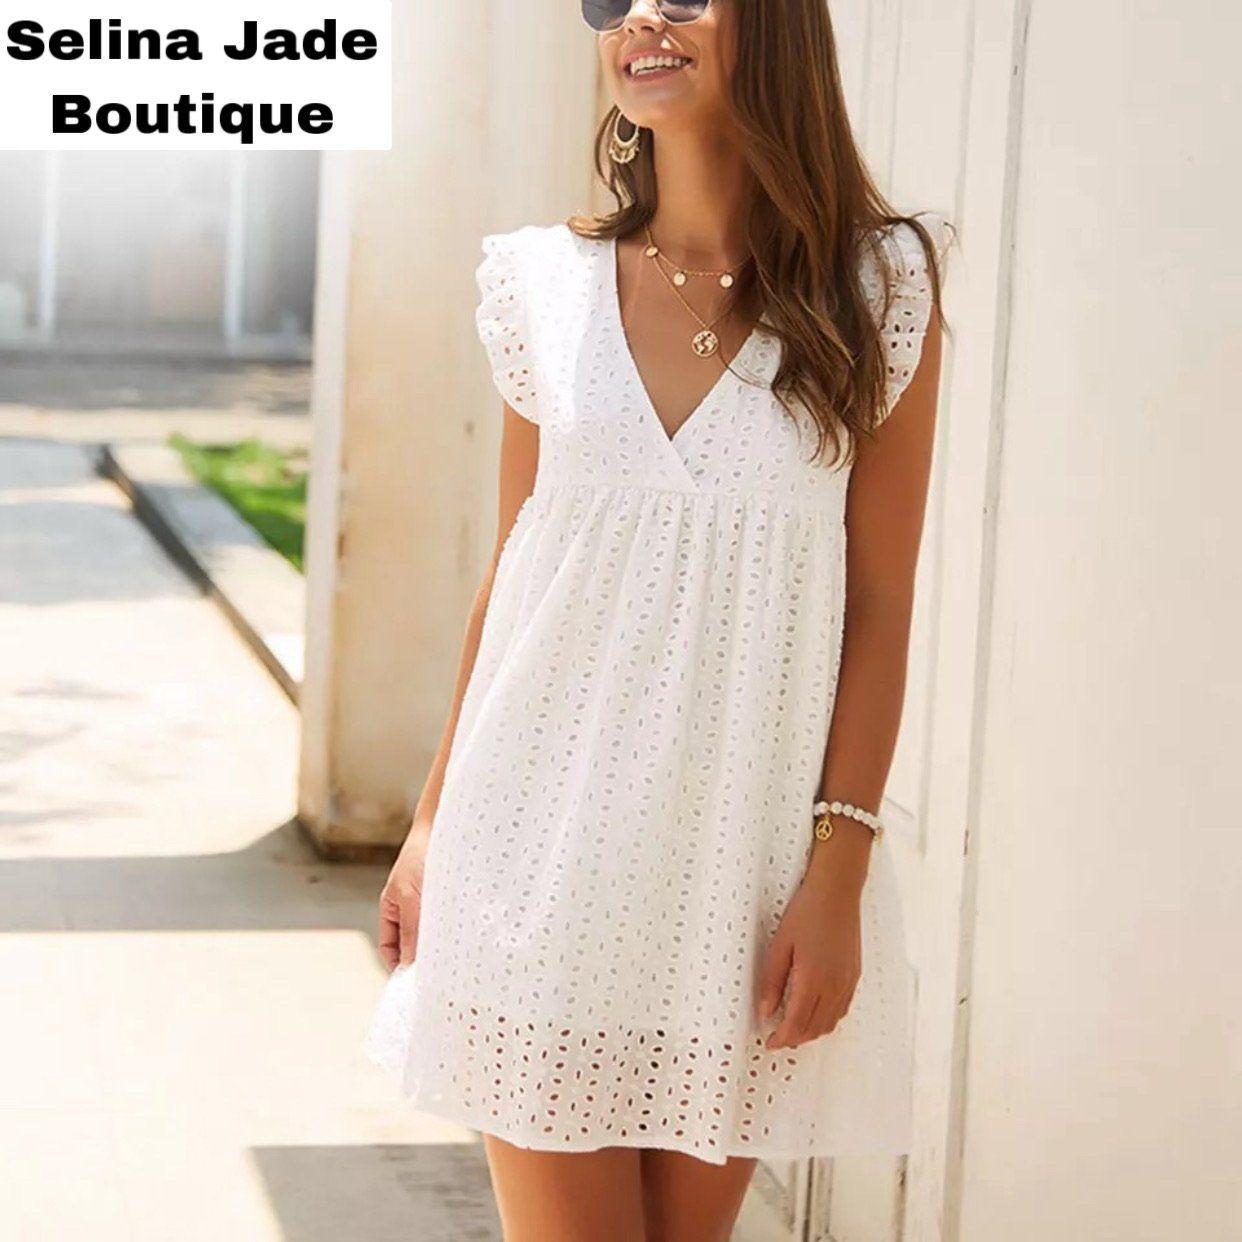 Celeste Eyelet Dress White Selina Jade Boutique White Loose Dress White Dress Summer Lace Dress Casual [ 1242 x 1242 Pixel ]